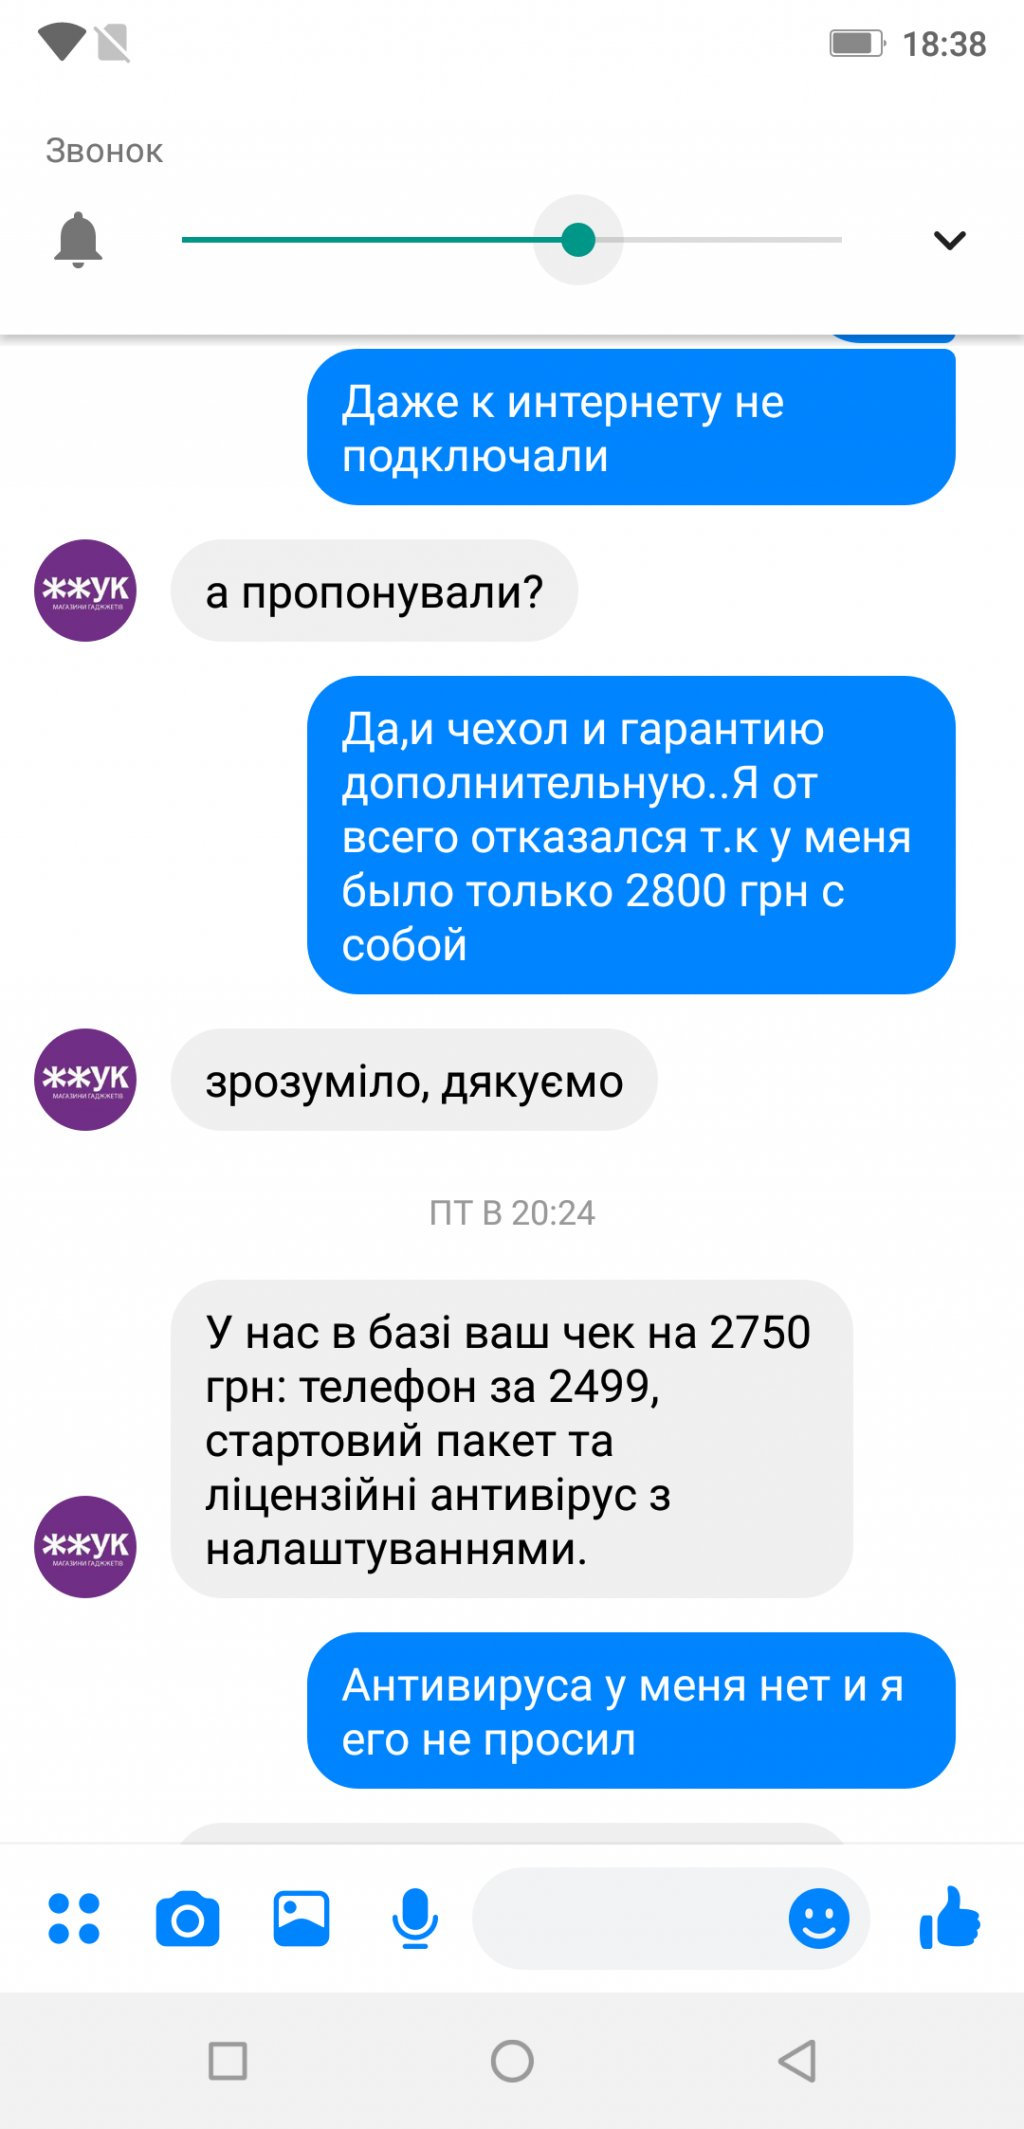 Жжук - Украли 200 грн